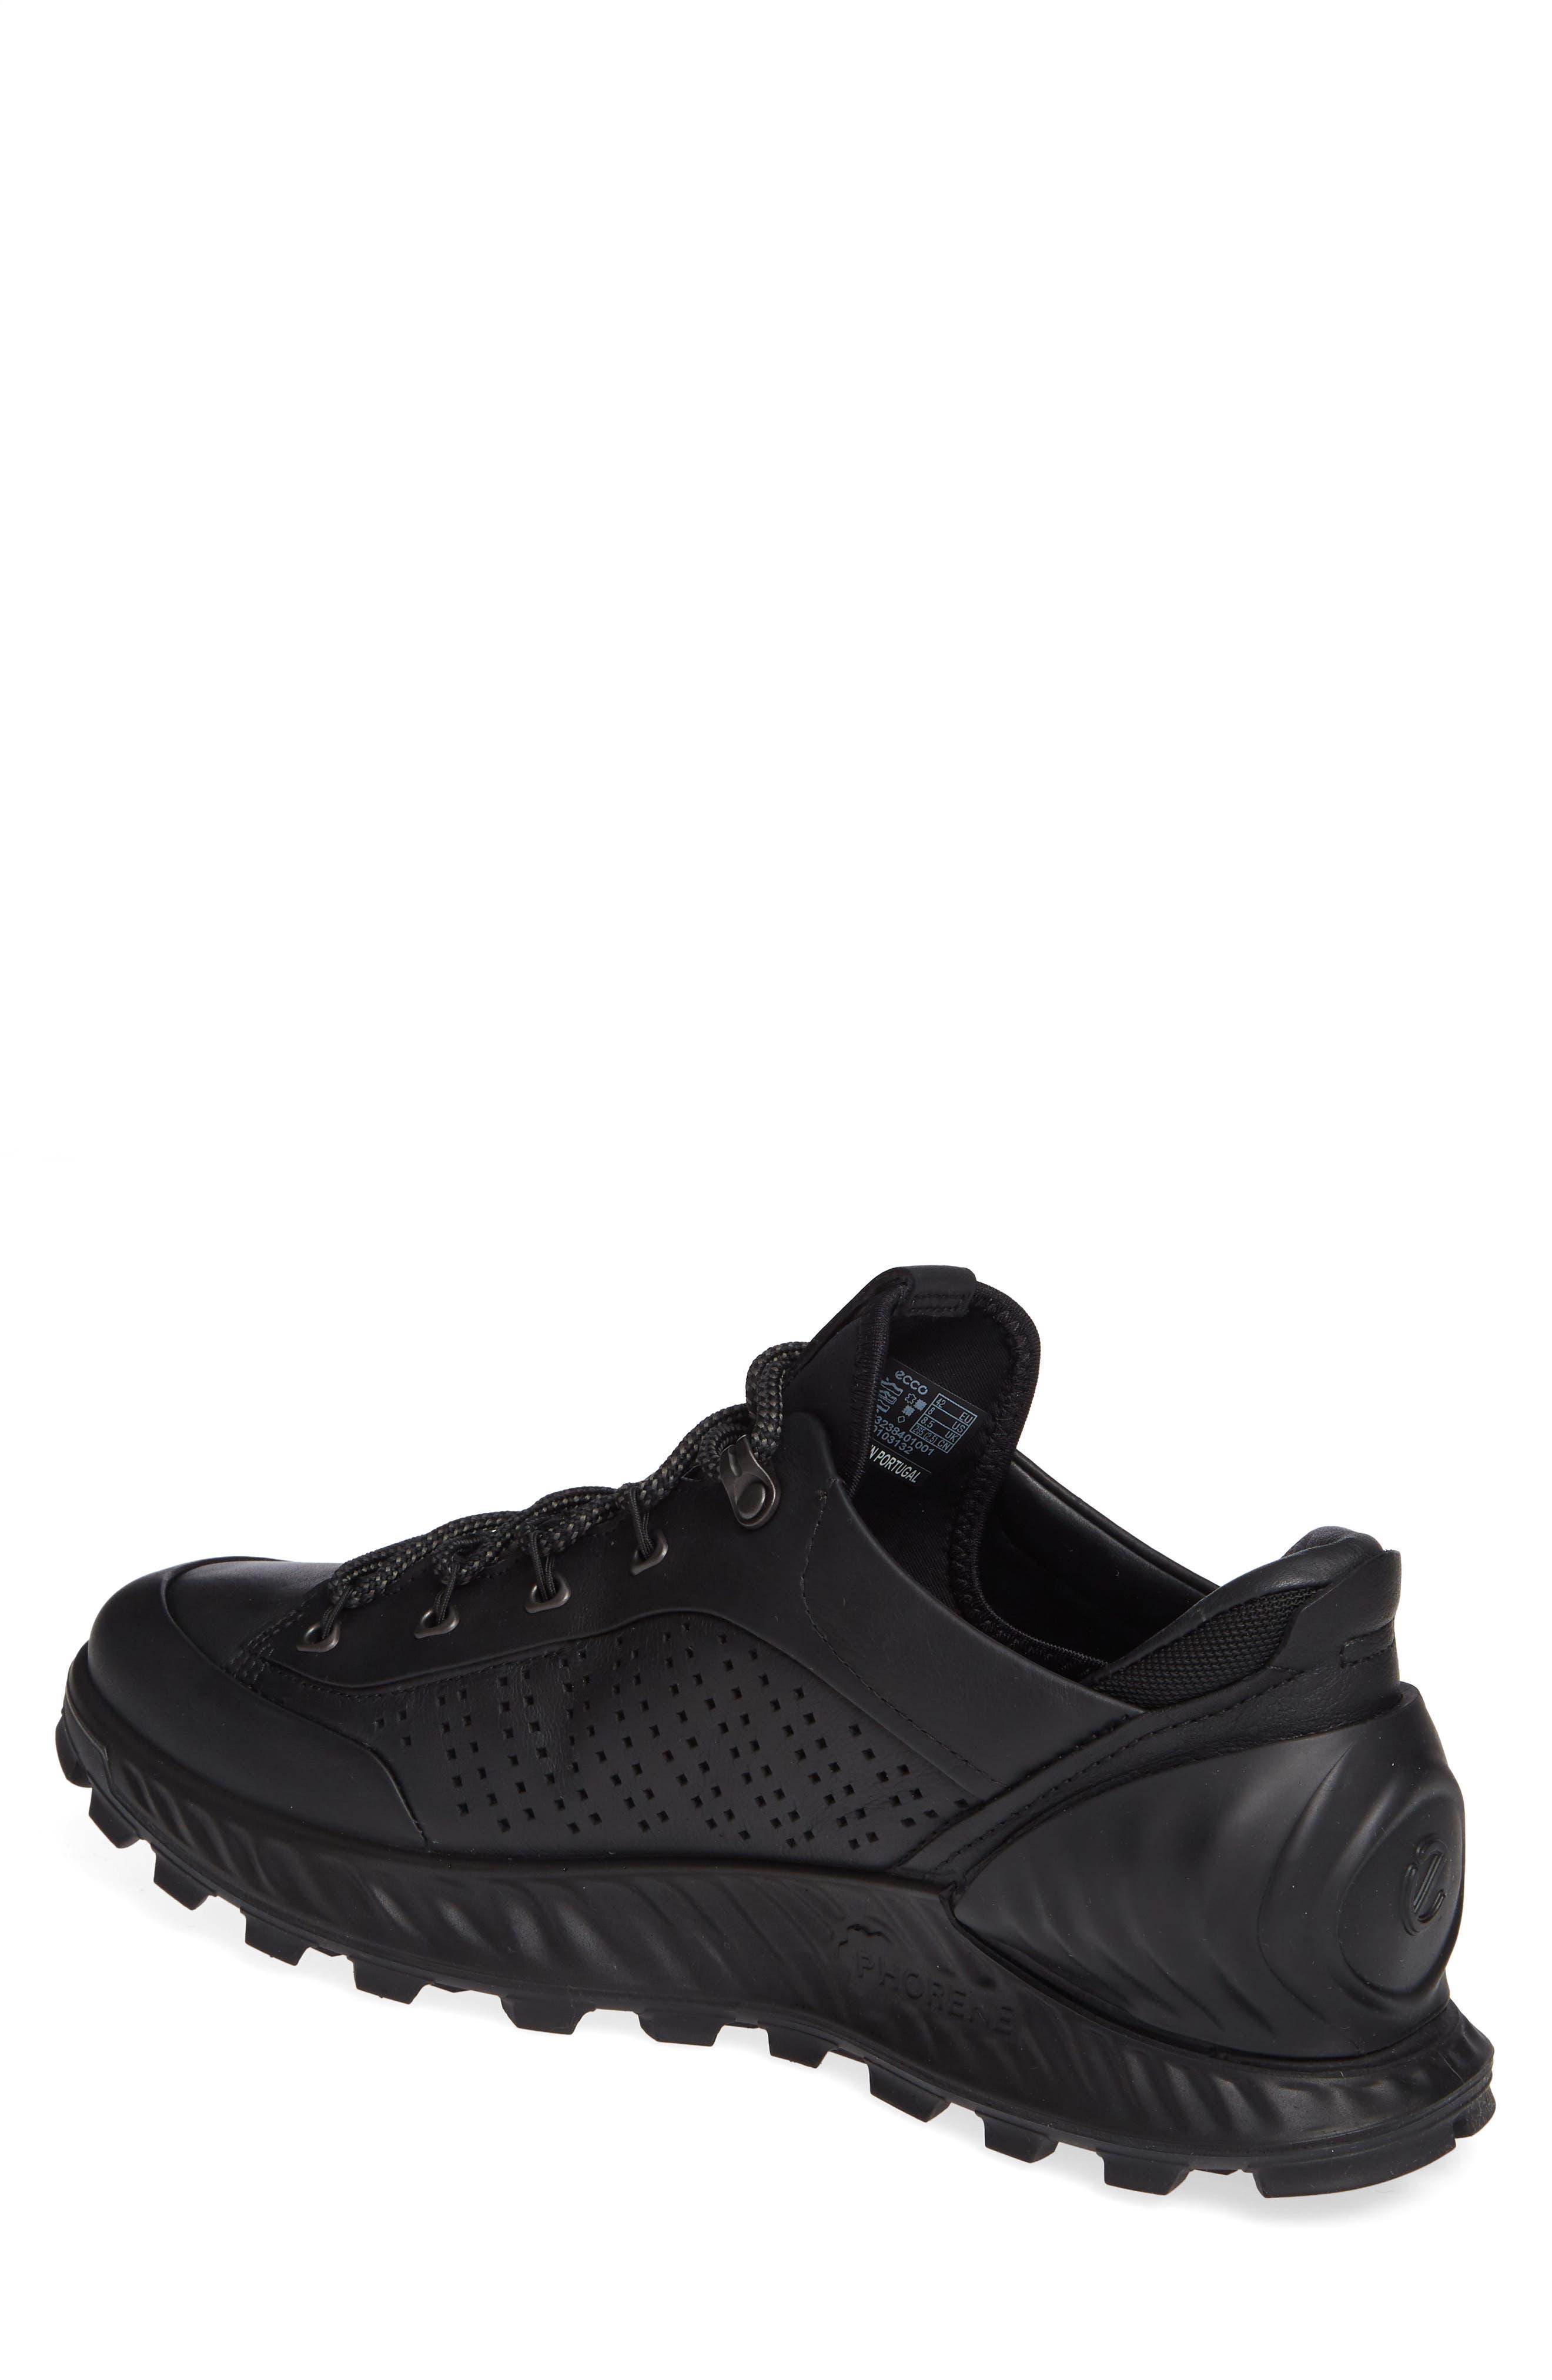 Exostrike High Top Sneaker,                             Alternate thumbnail 2, color,                             BLACK LEATHER